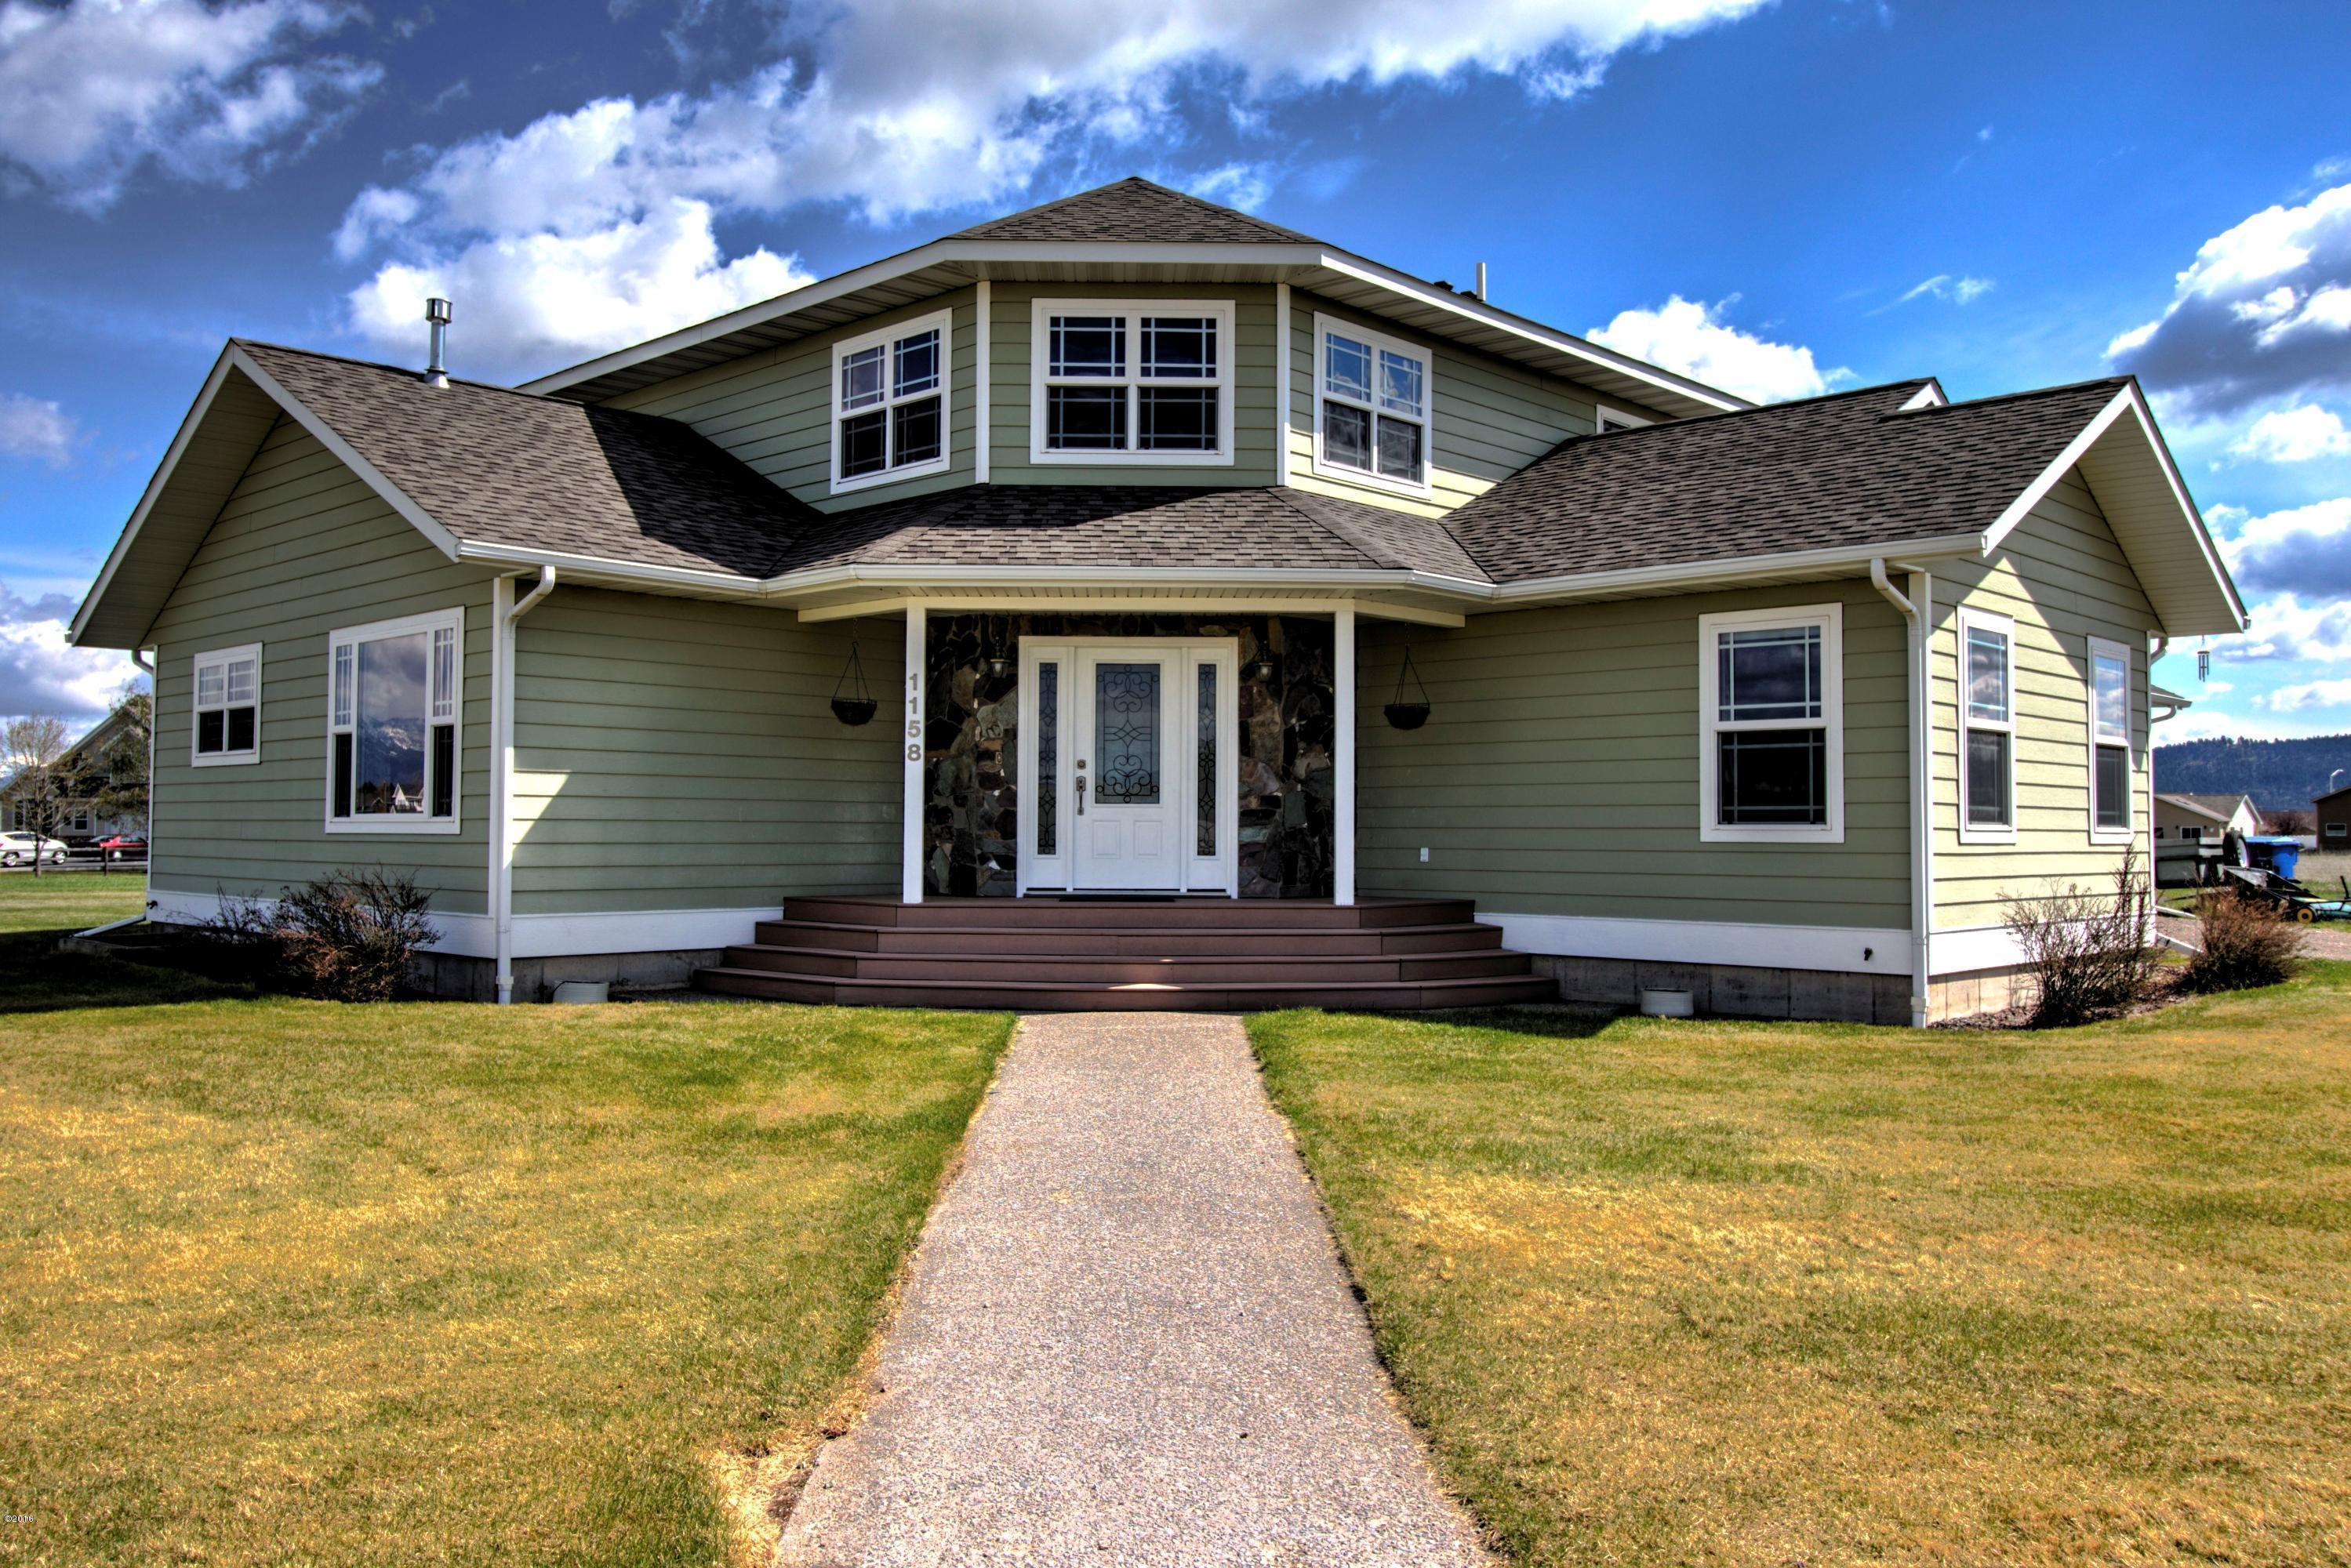 Single Family Home for Sale at 1158 Quarter Horse Lane Kalispell, Montana 59901 United States